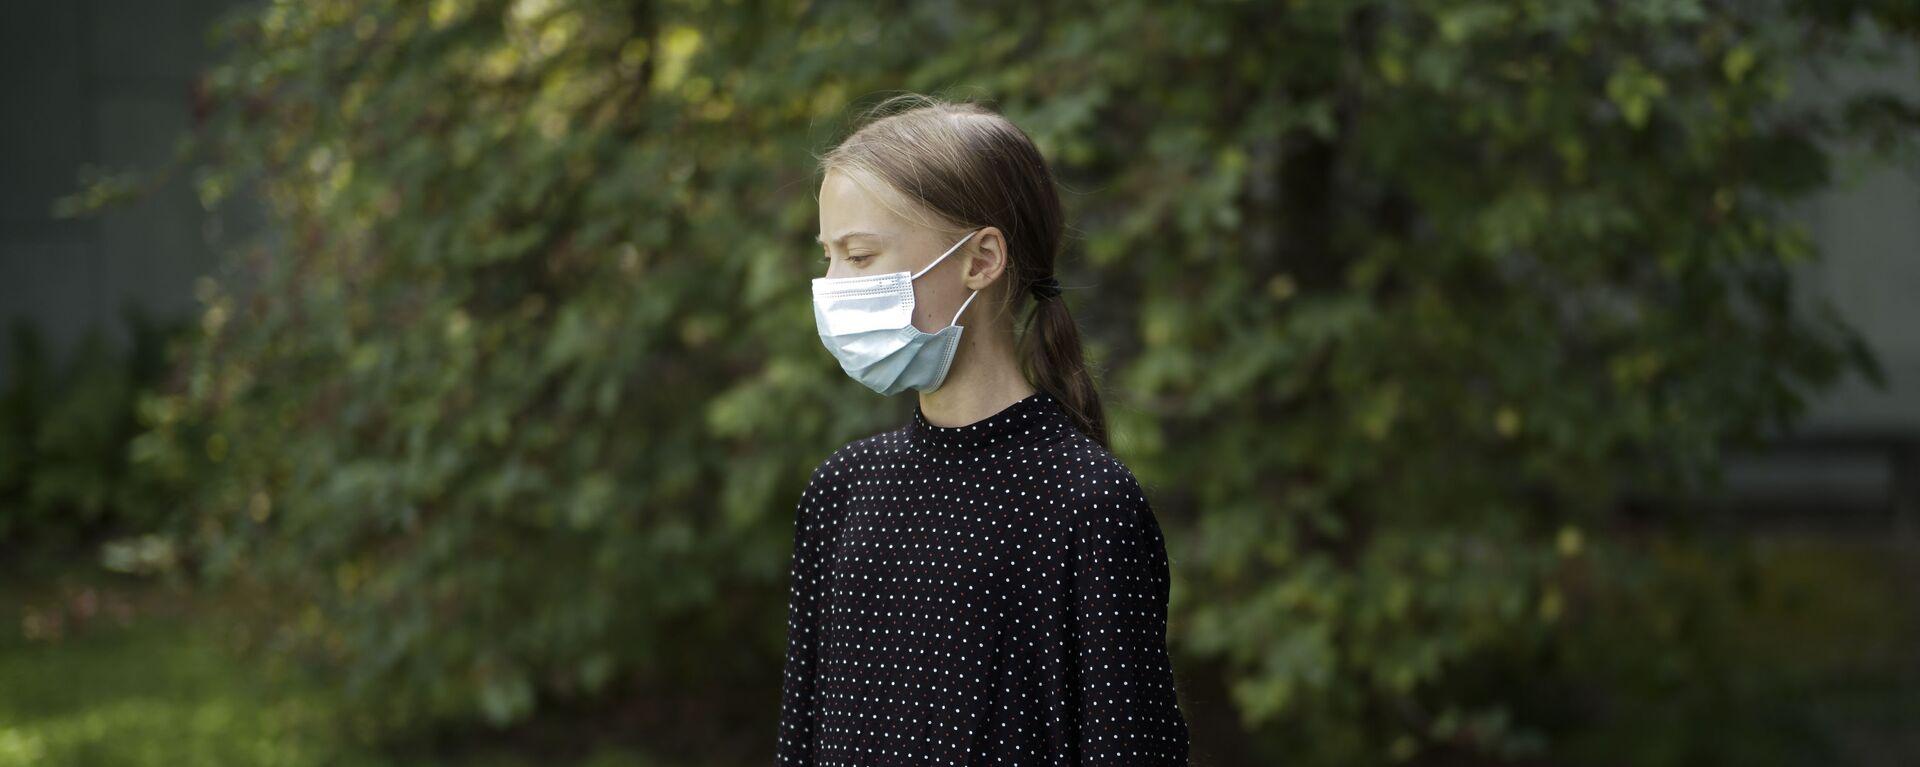 Greta Thunberg, activista ecológica  - Sputnik Mundo, 1920, 09.03.2021